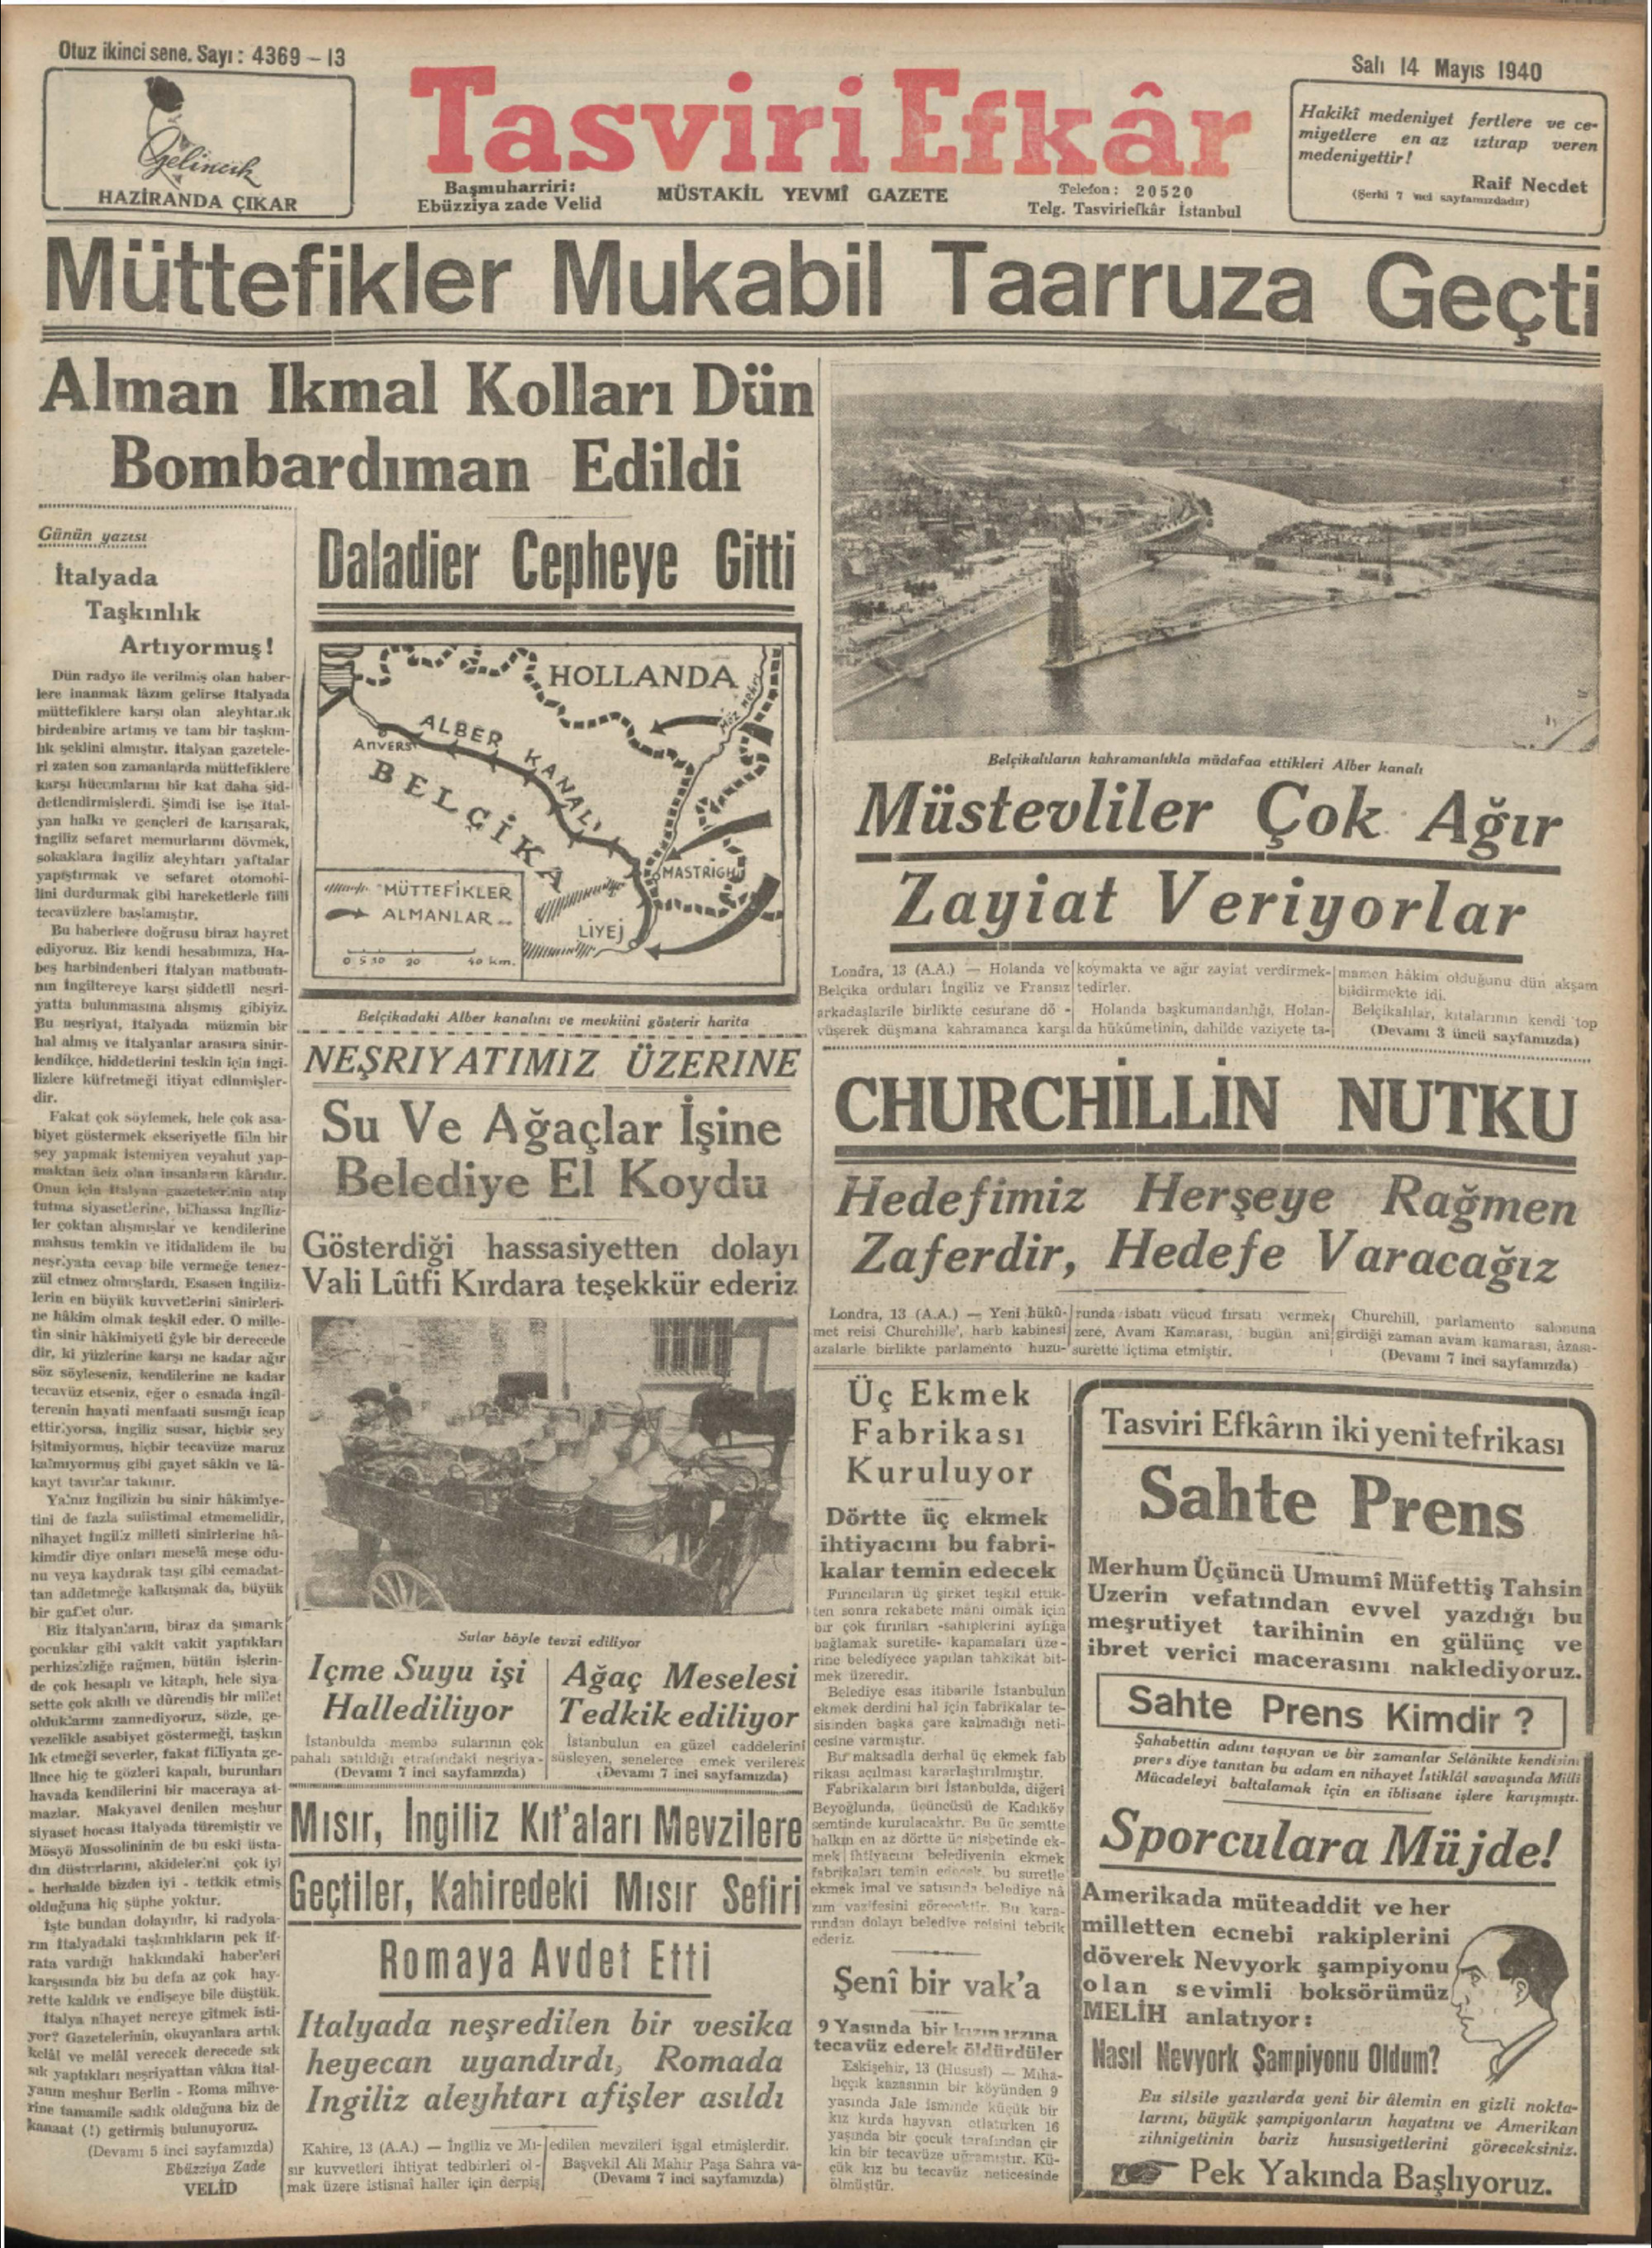 14 Mayıs 1940 Tarihli Tasviri Efkar Gazetesi Sayfa 1